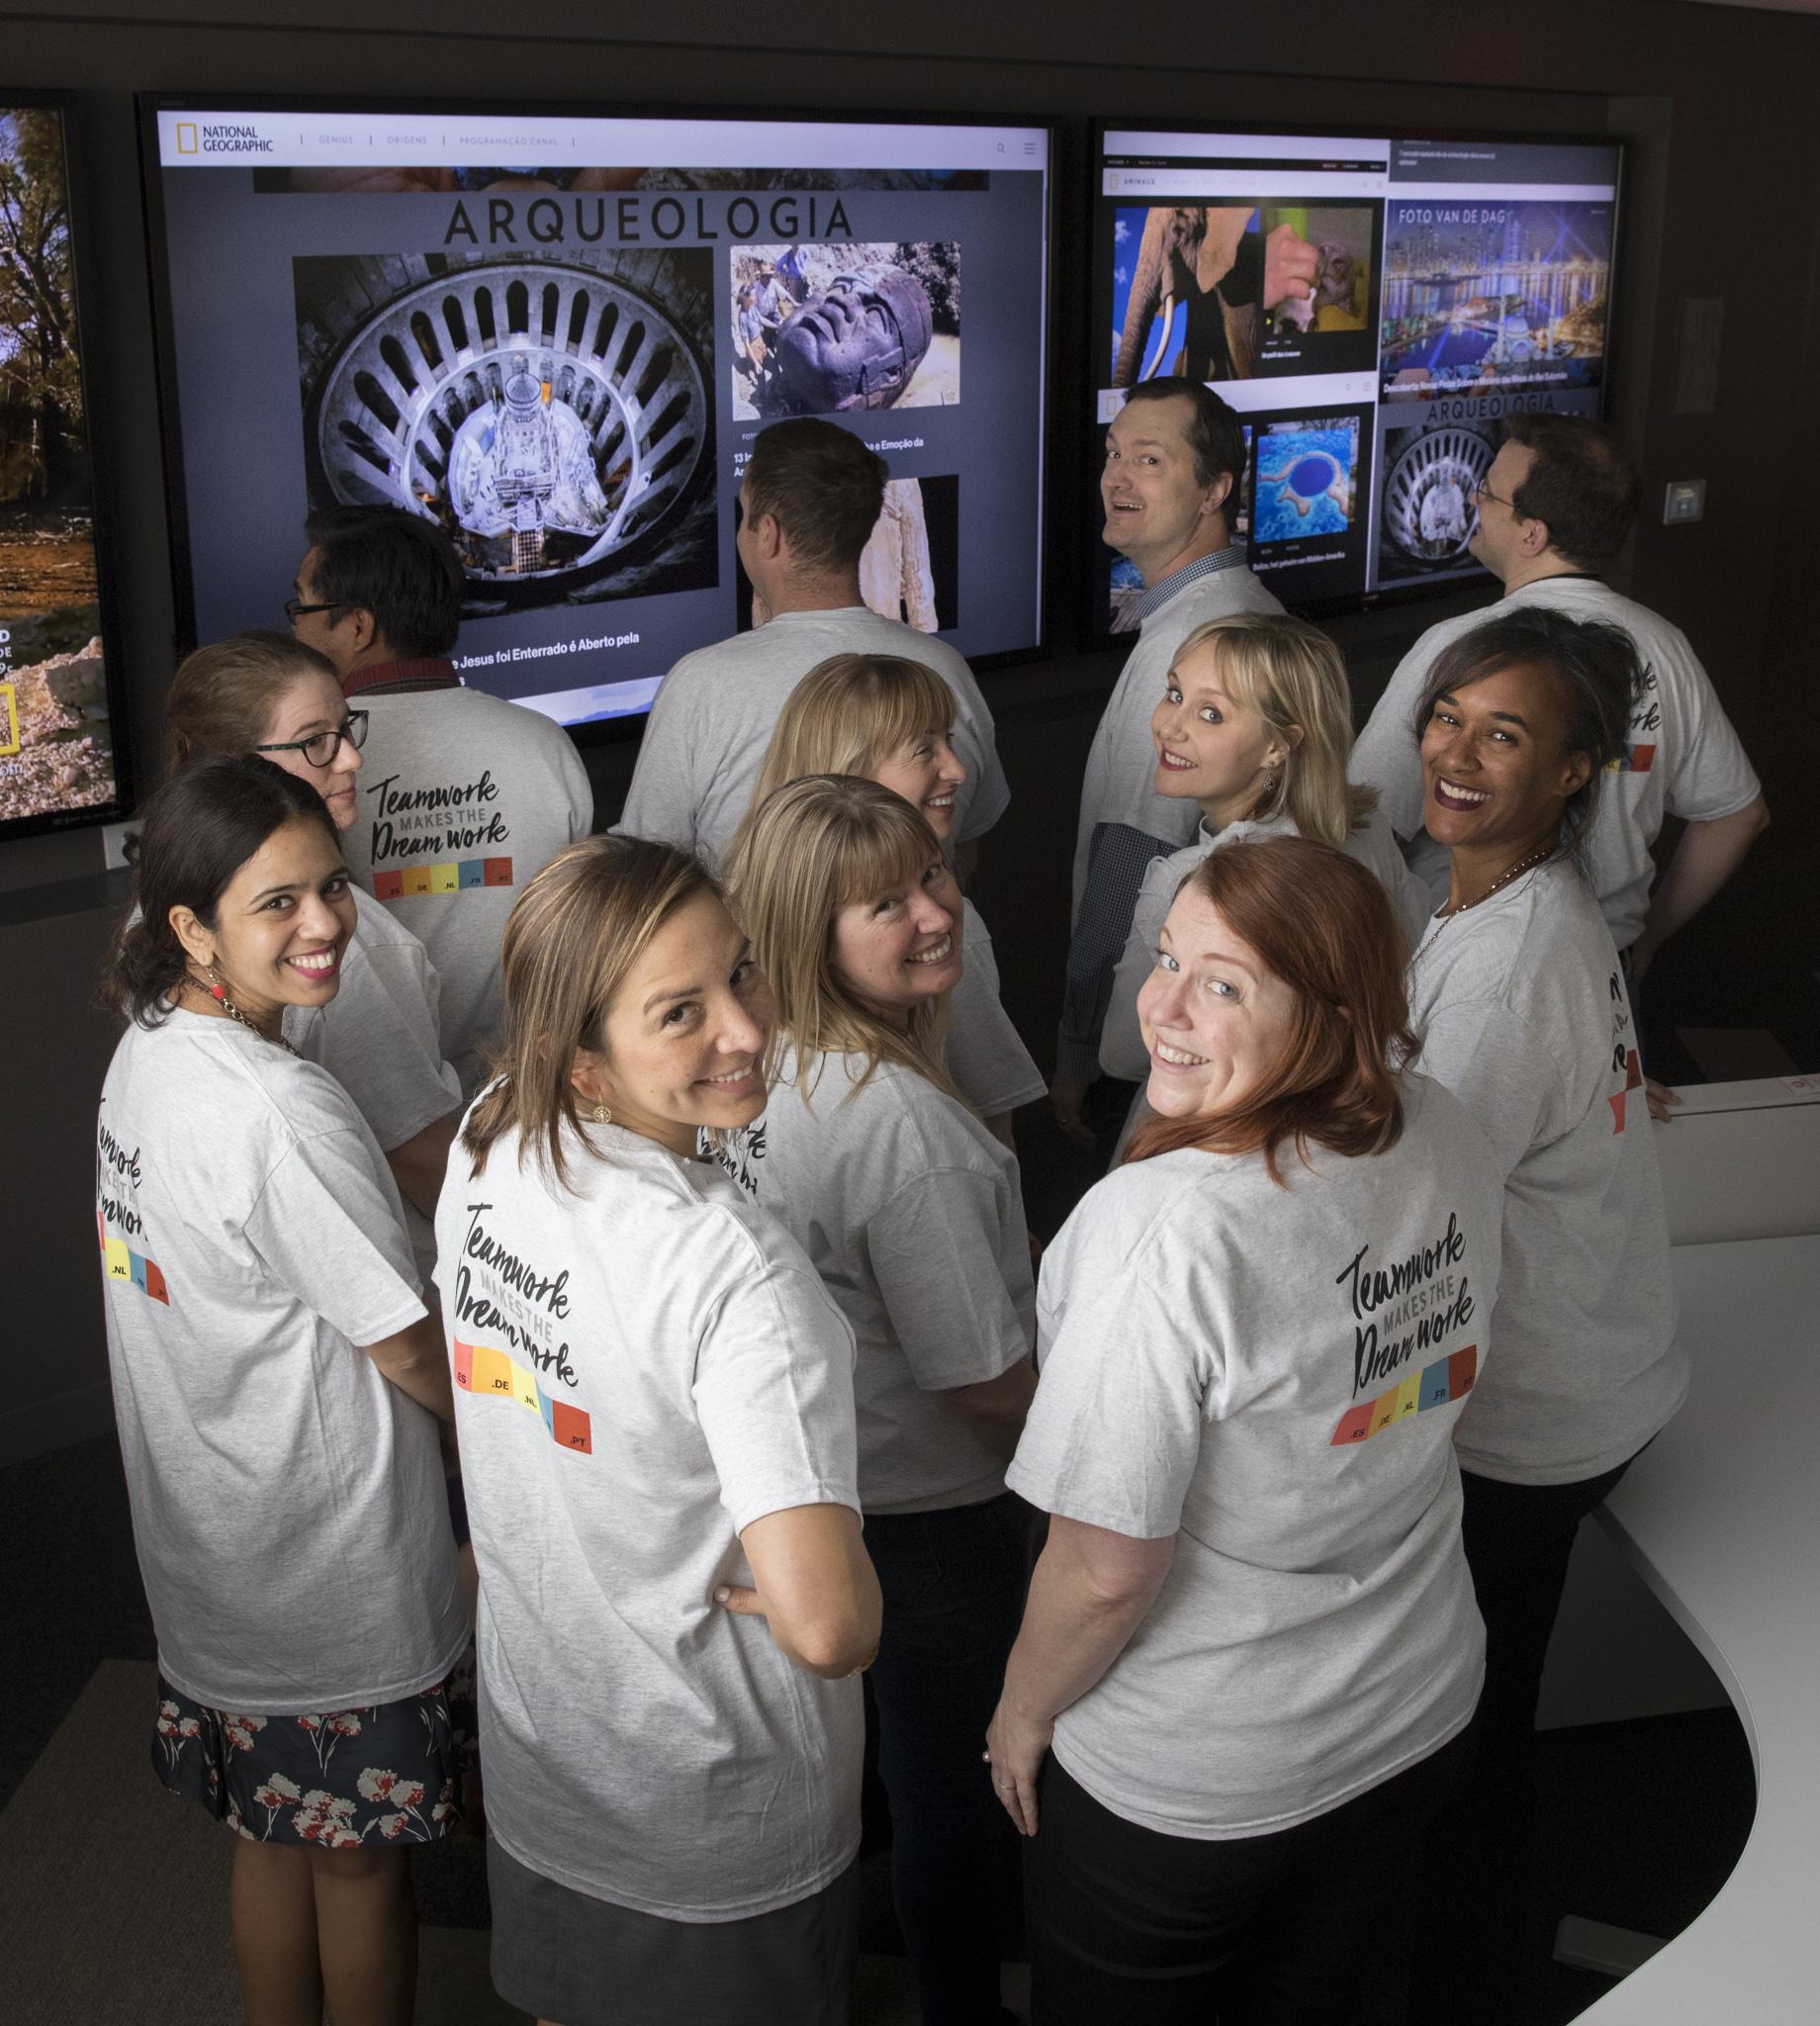 Custom T Shirts For Teamwork Makes The Dream Work Shirt Design Ideas